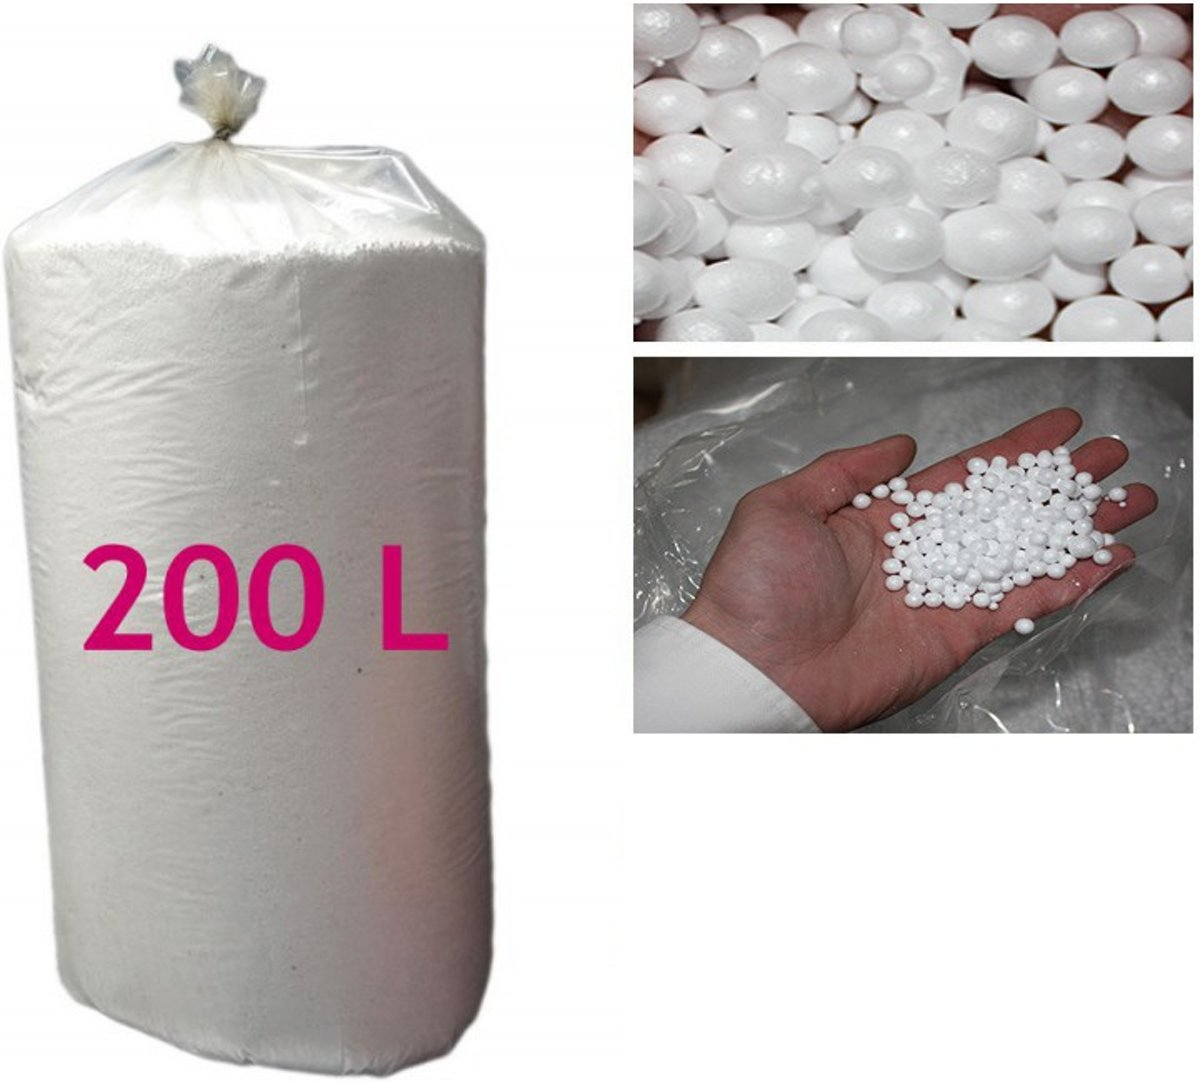 Zitzakvulling EPS PARELS 200 Liter *Nergens Goedkoper* kopen